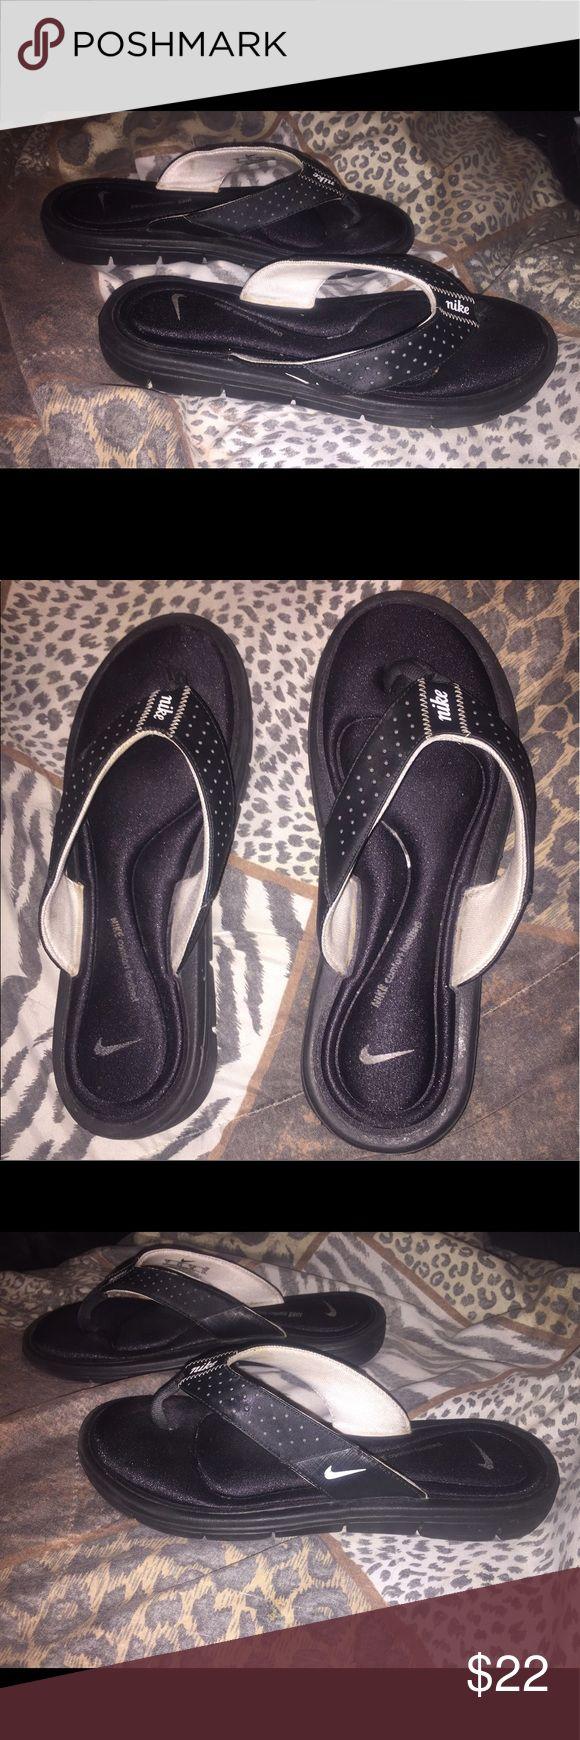 💋NWOT! NIKE Black Memory Foam Flip Flops Size 7 AWESOME NIKE FLIPS FLOPS! With Memory Foam. Size 7. ABSOLUTELY NEVER WORN! Nike Shoes